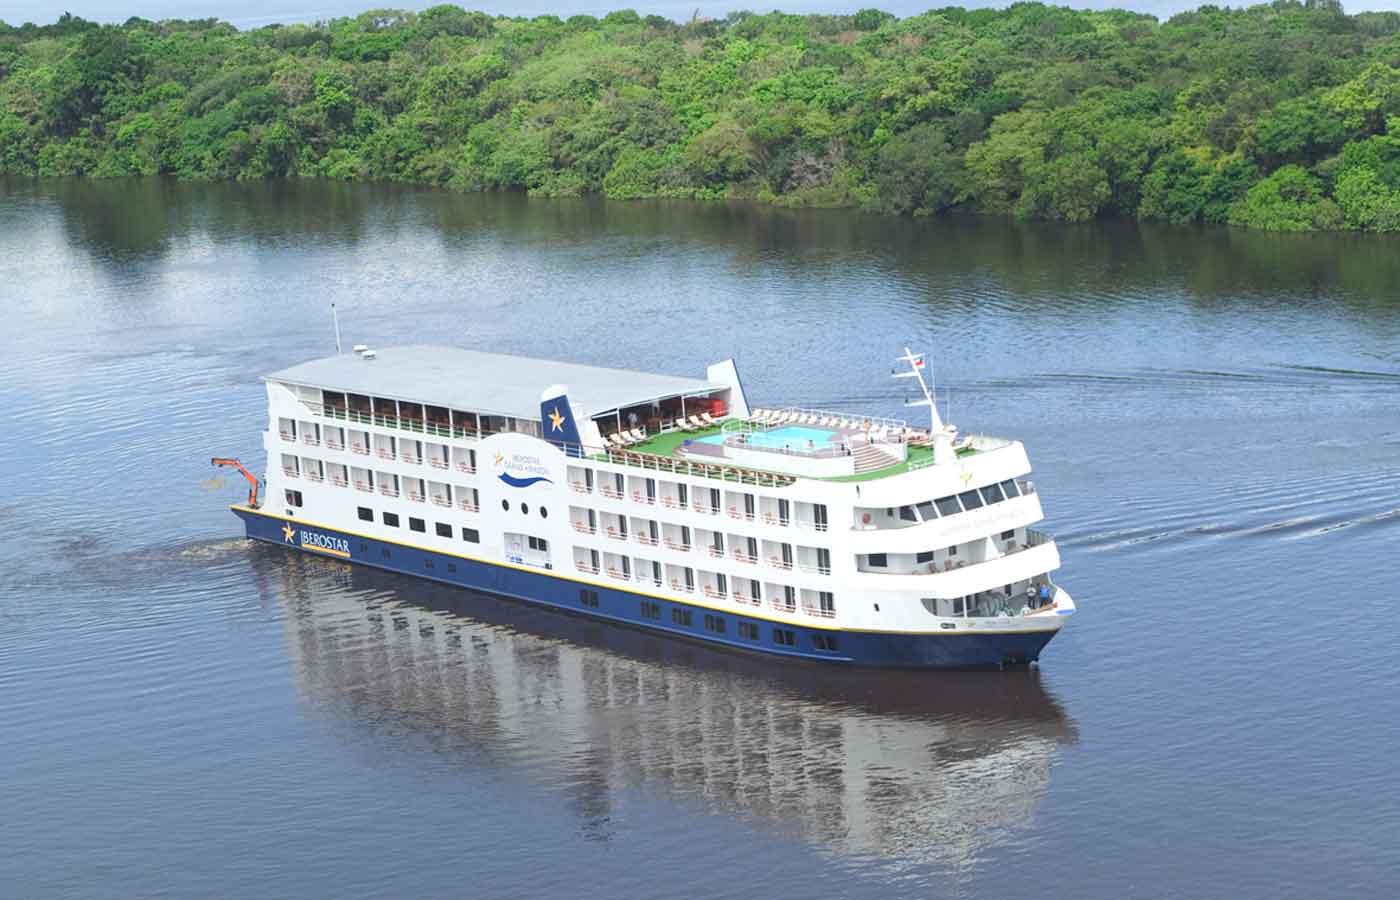 Iberostar Grand Amazon Cruise, Brazil